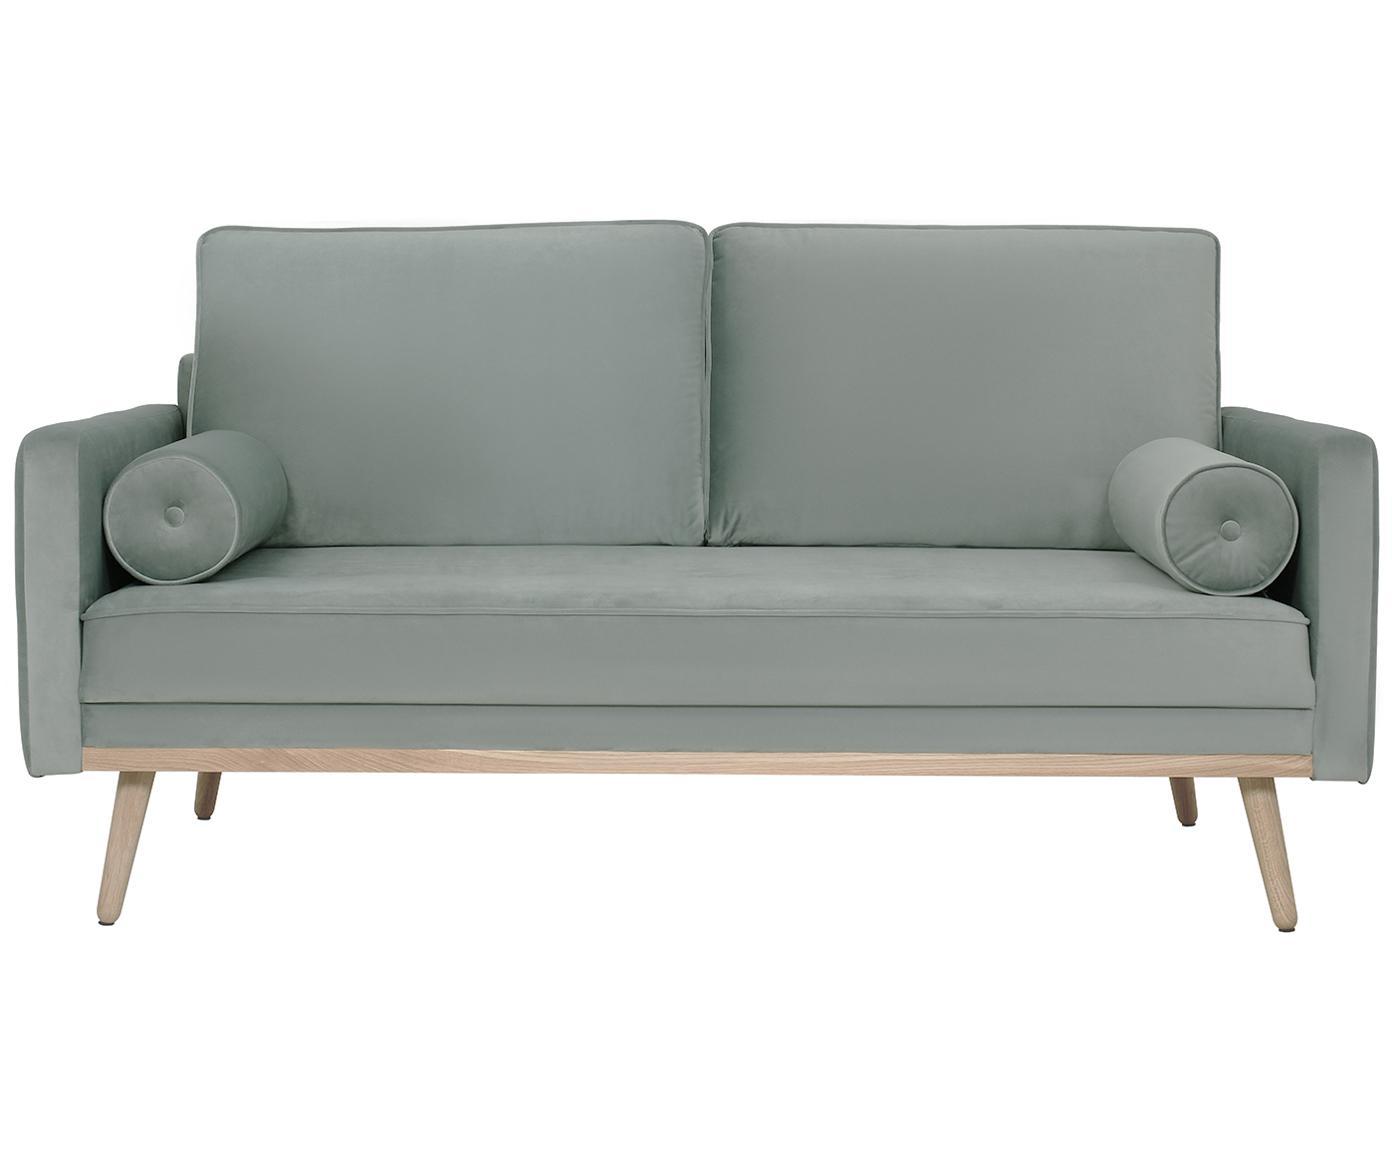 Samt-Sofa Saint (2-Sitzer), Bezug: Samt (Polyester) Der hoch, Gestell: Massives Kiefernholz, Spa, Samt Salbeifarben, B 169 x T 87 cm